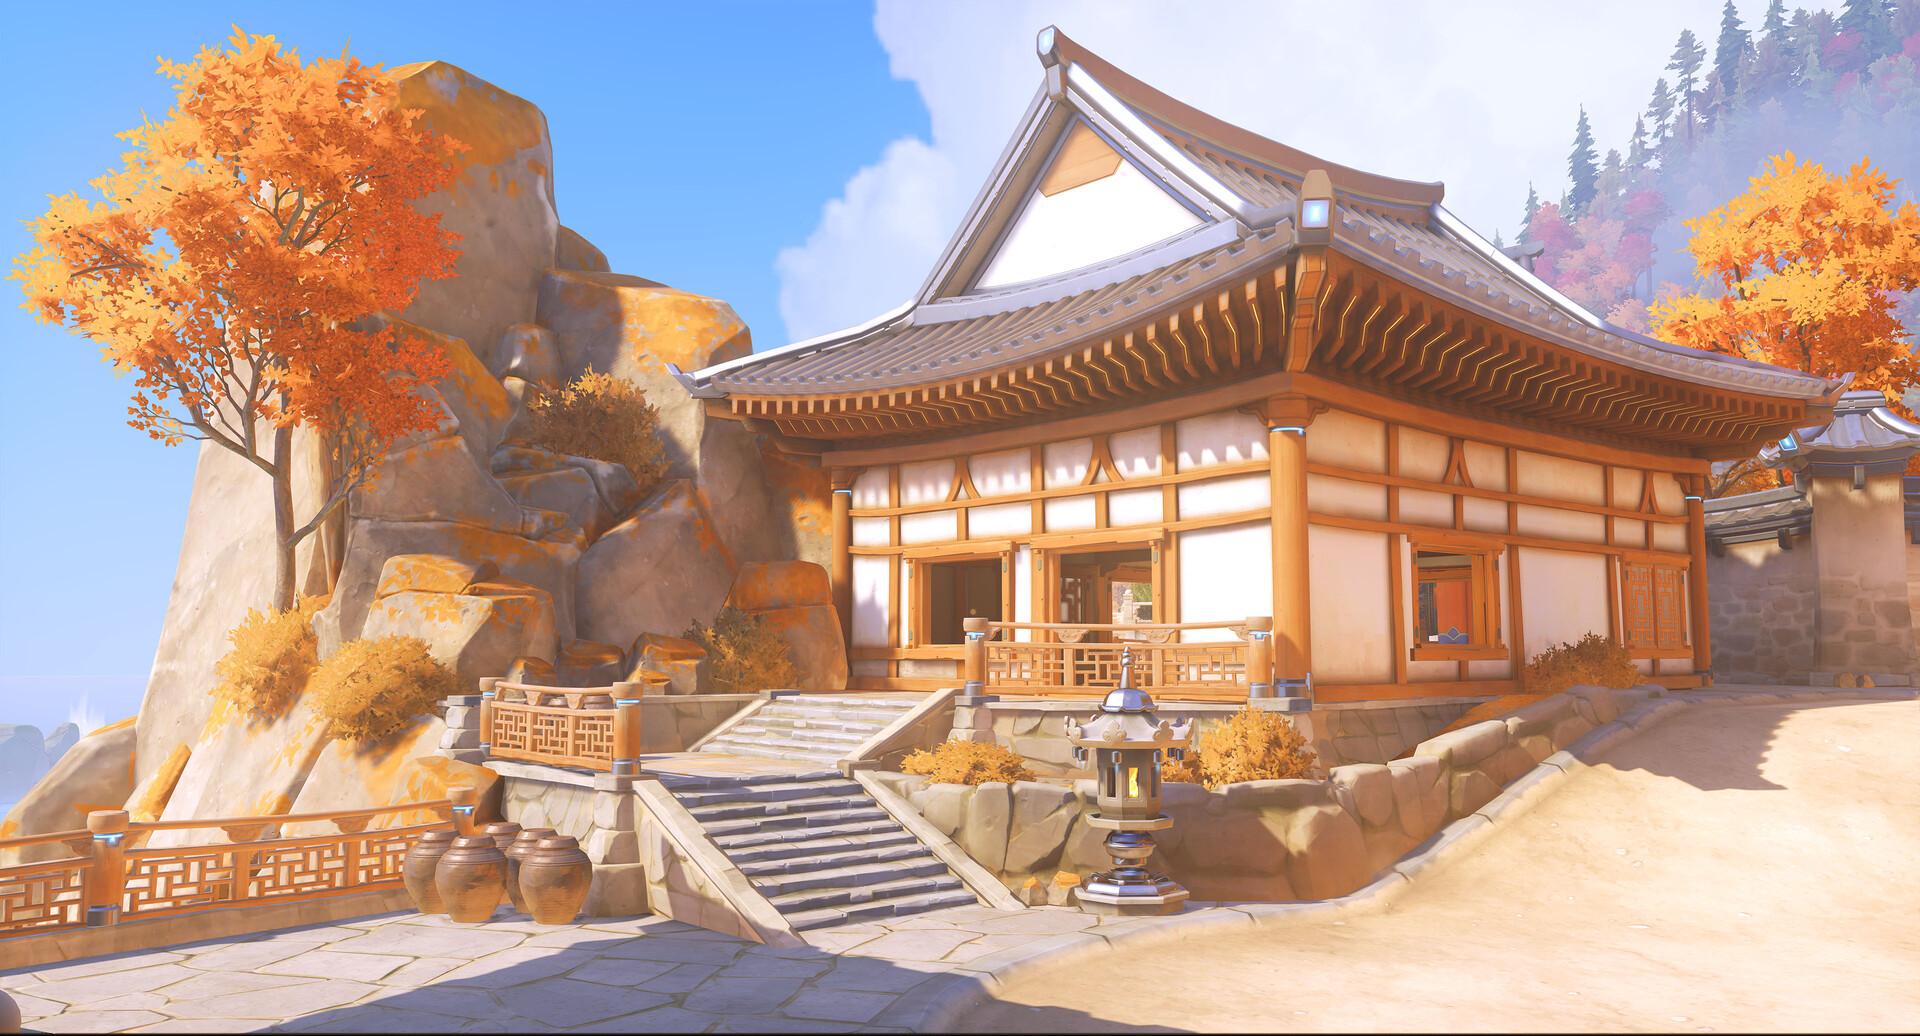 Helder pinto busan temple 07